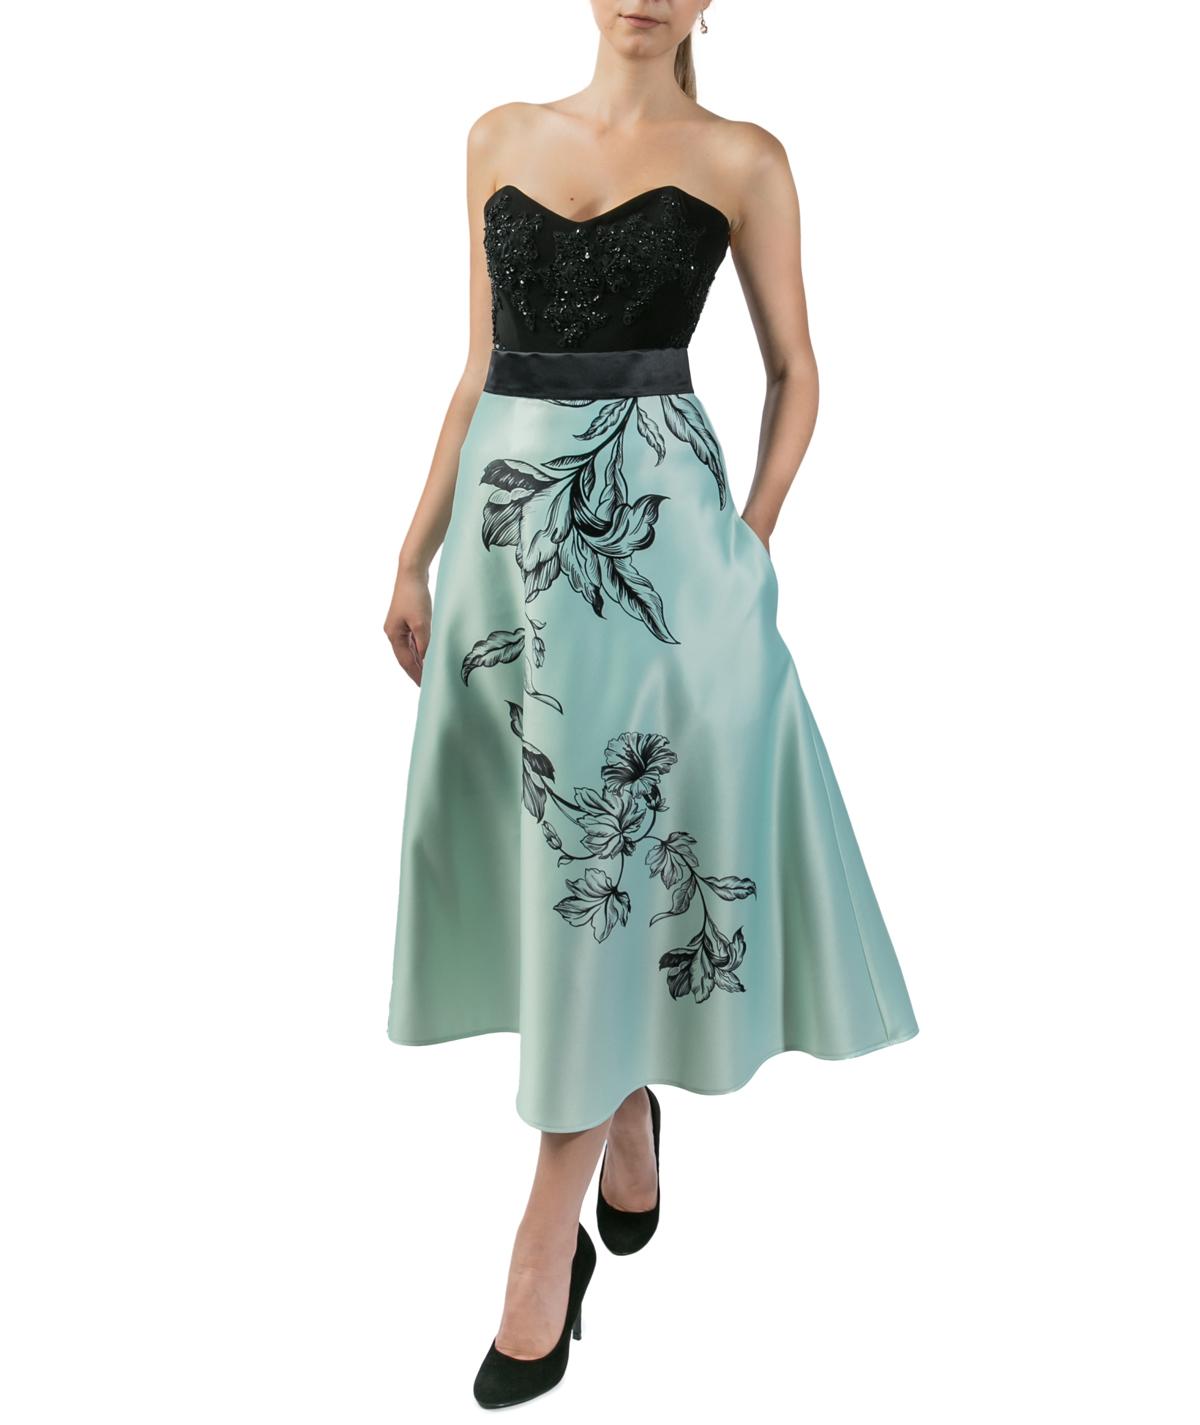 e14db2822 Green Tulip - Midi Cocktail Skirt